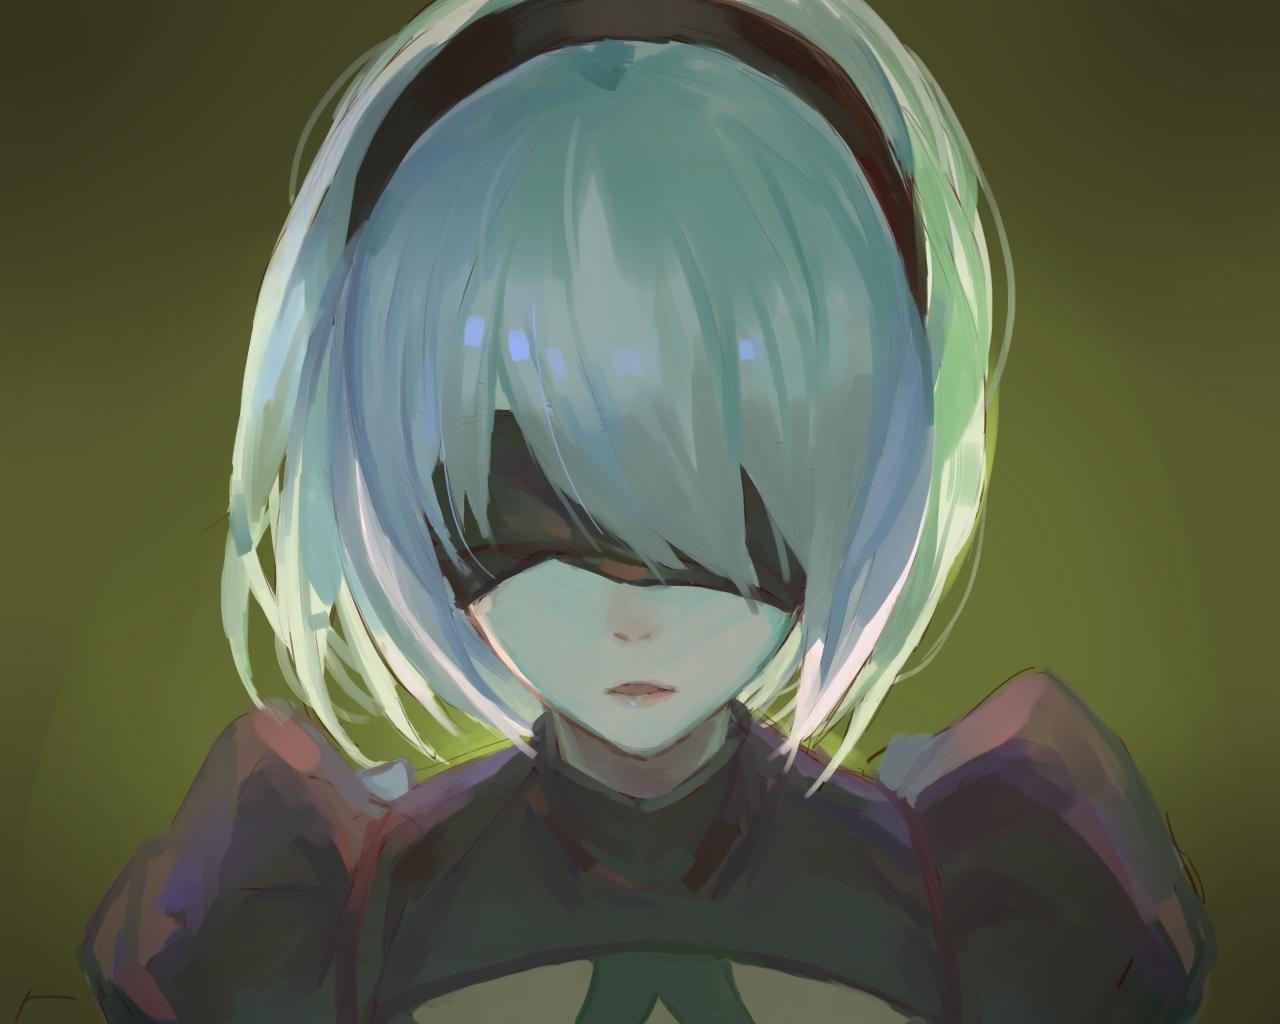 blindfold close green headband nier nier:_automata red_cucumber short_hair sketch white_hair yorha_unit_no._2_type_b